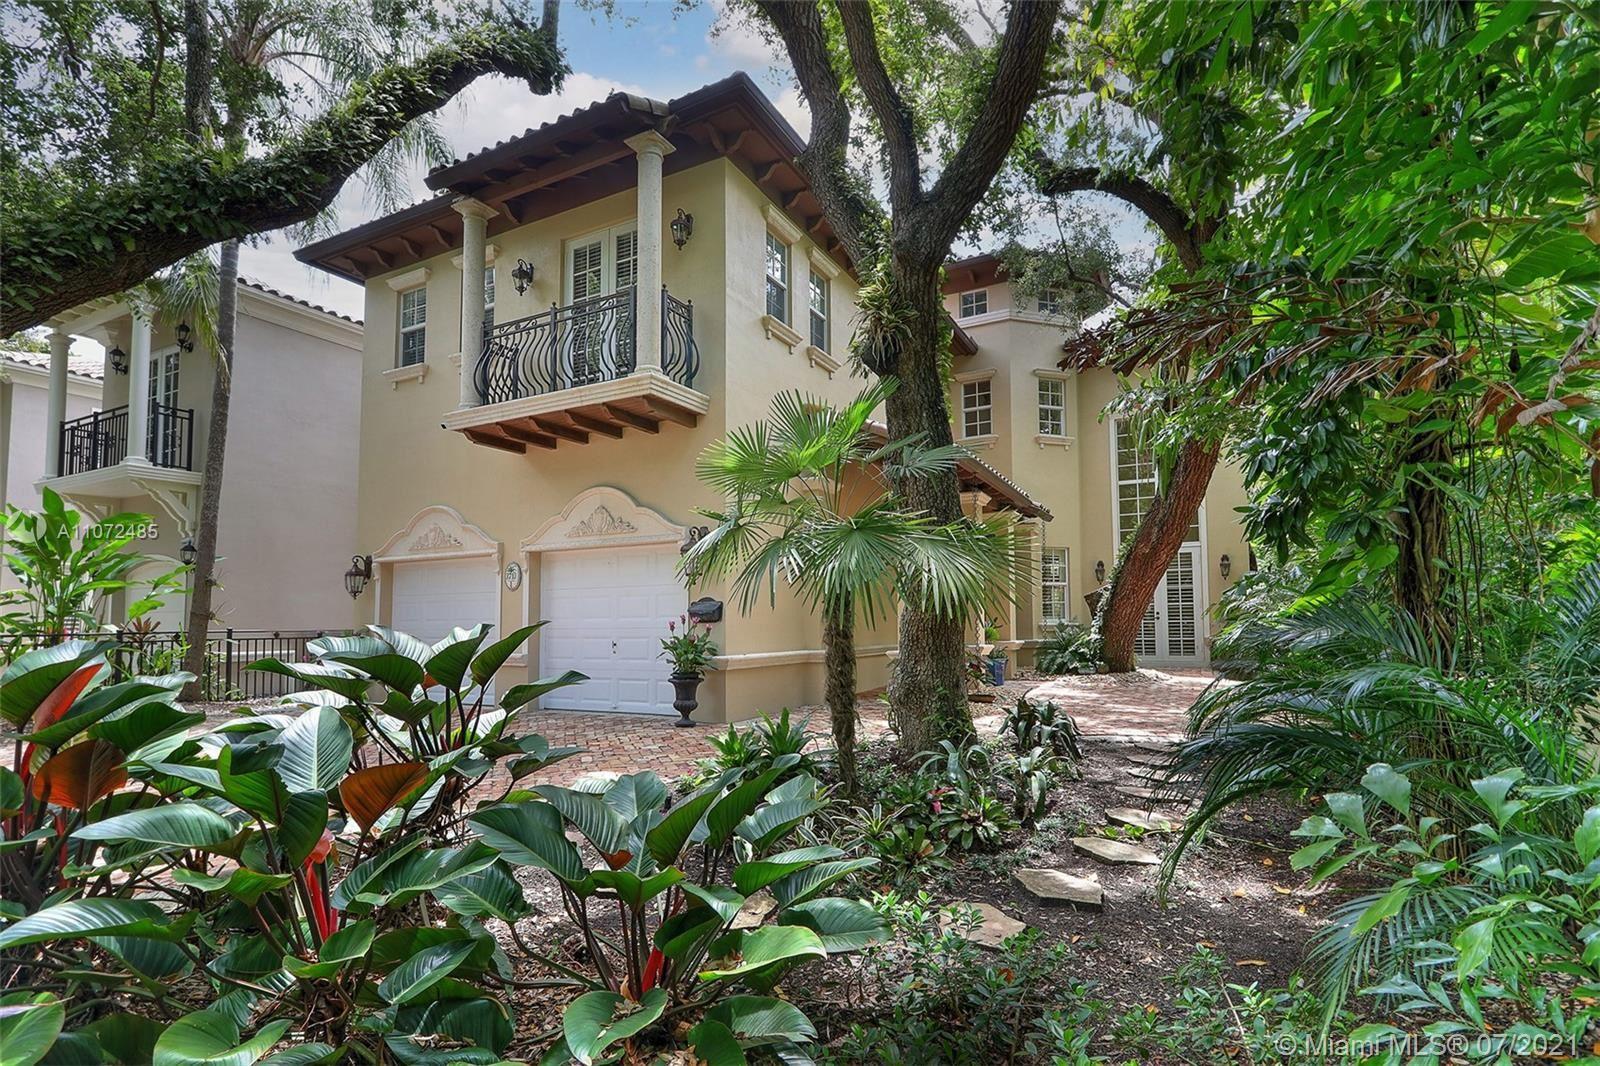 3710 Frantz Rd, Miami, FL 33133 - #: A11072485